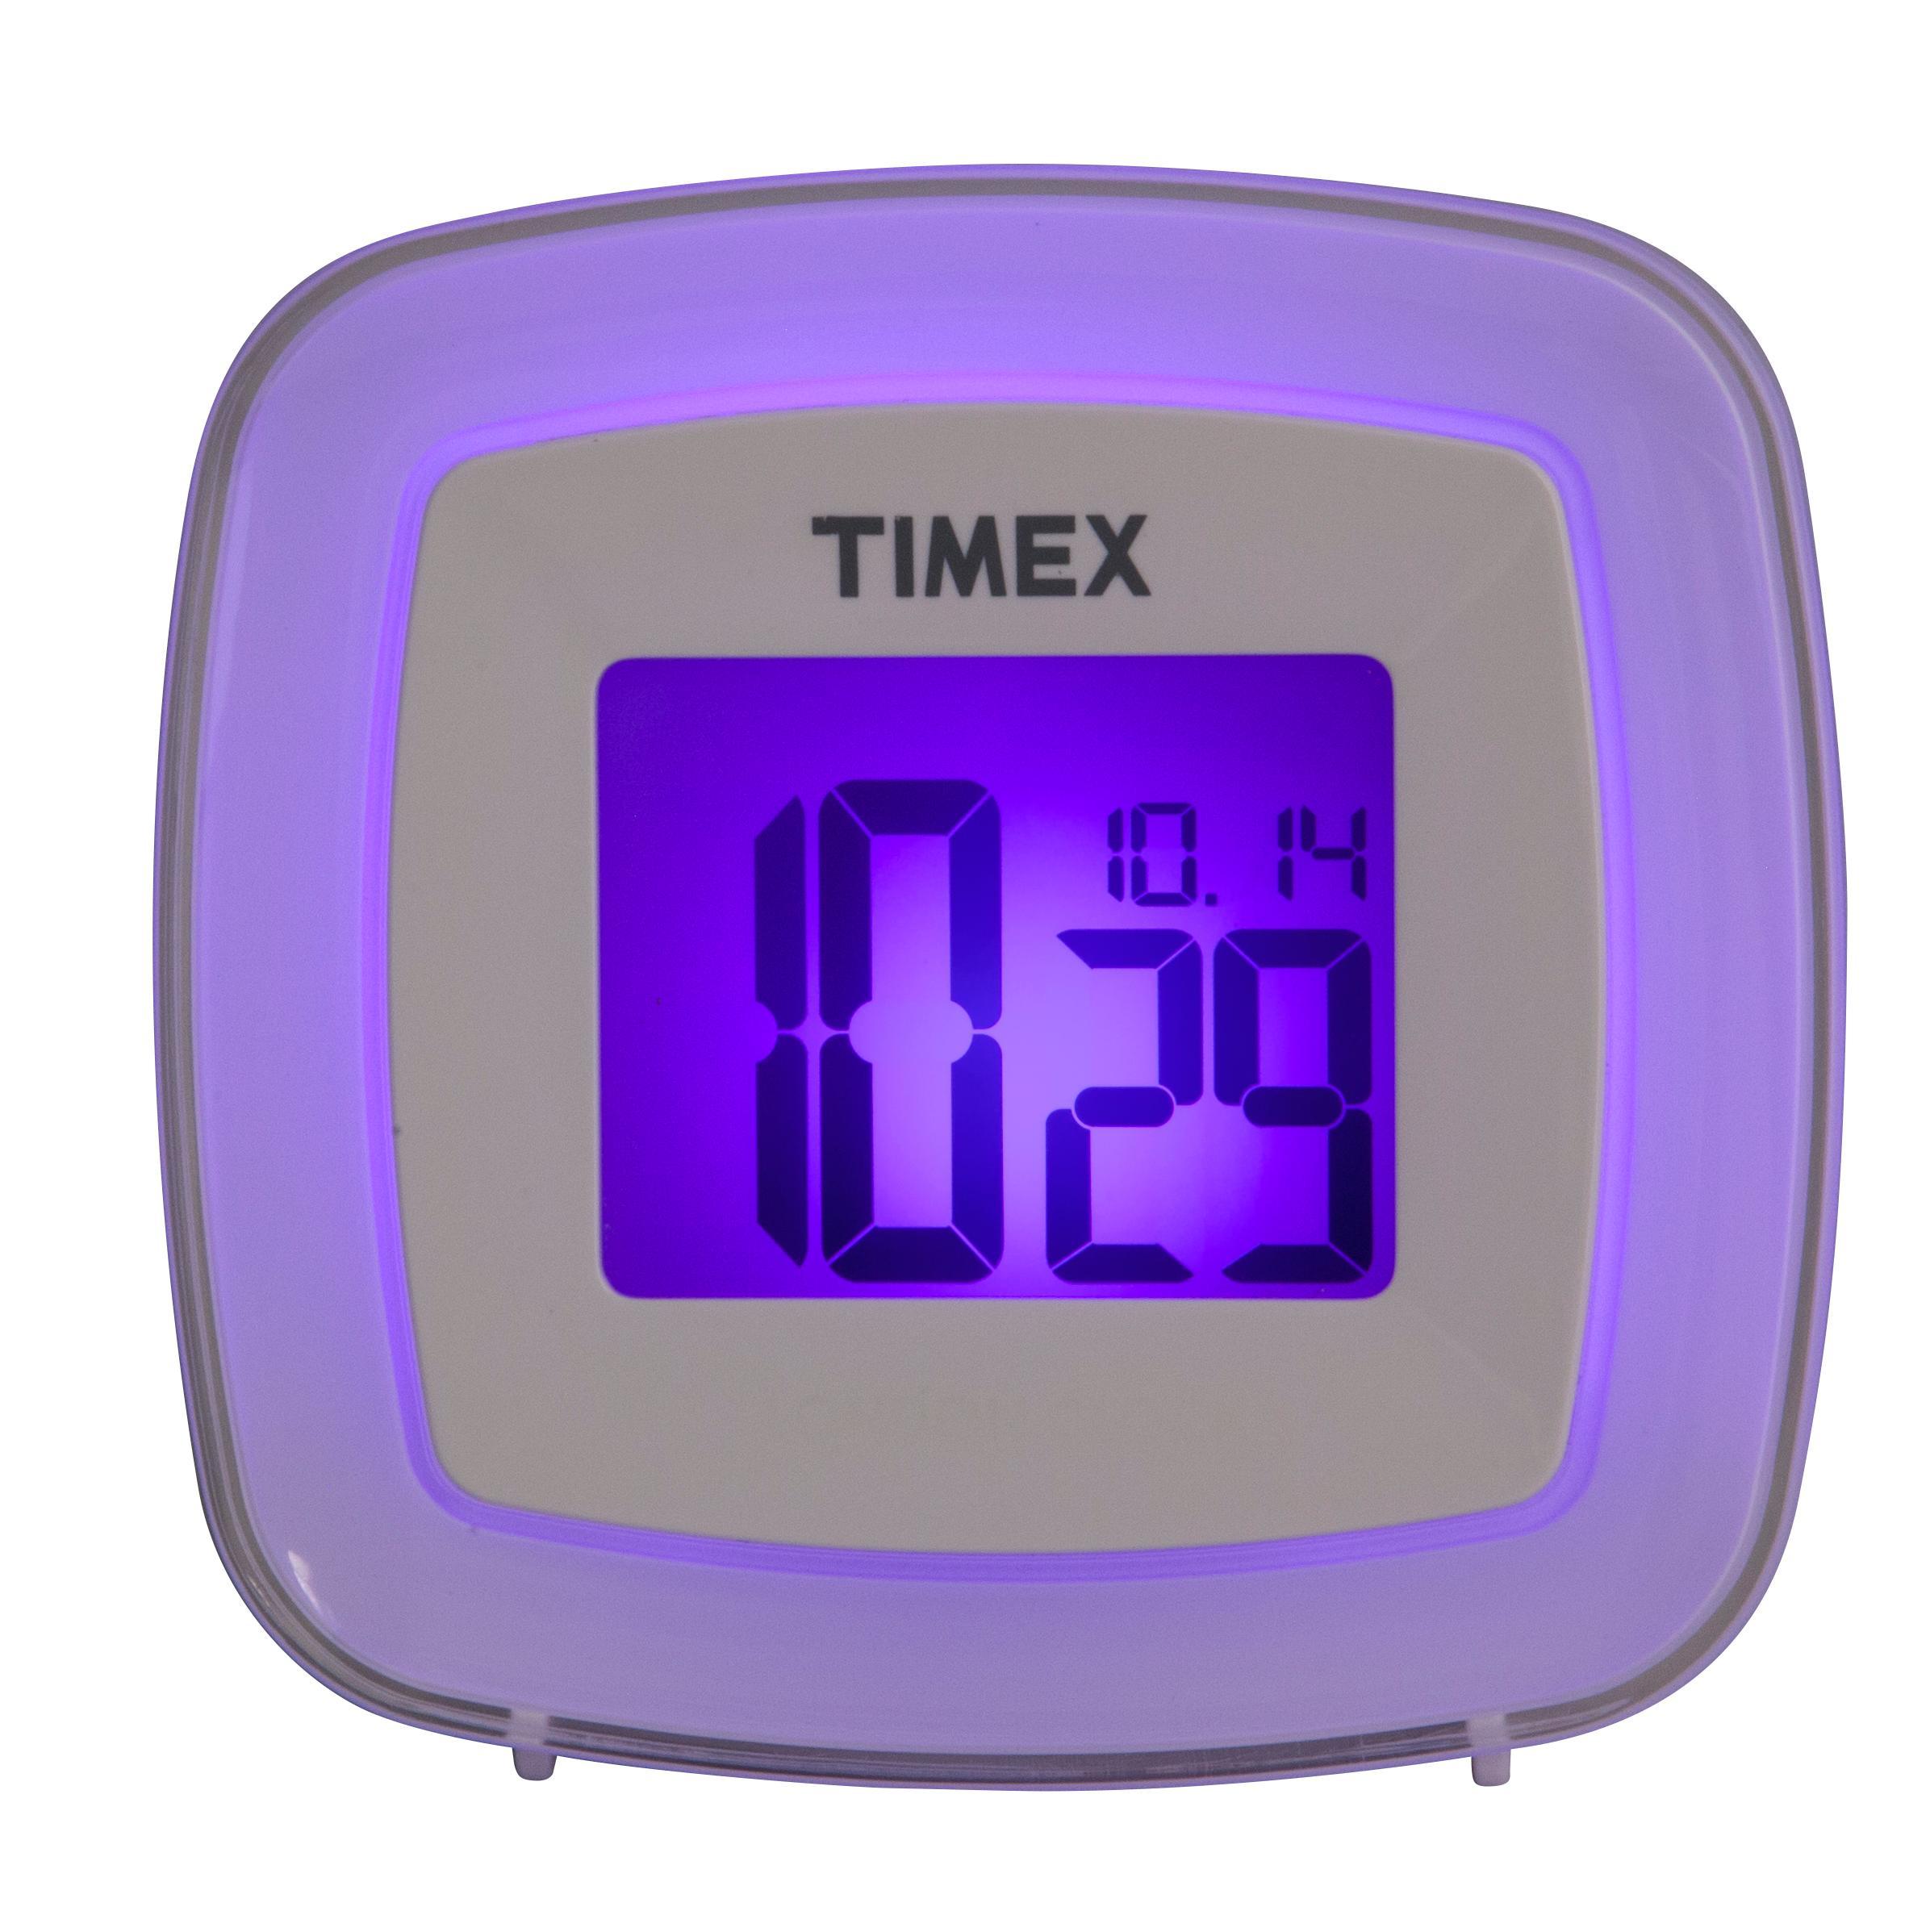 amazon com timex t104w color changing dual alarm clock electronics rh amazon com Loud Annoying Alarm Clocks timex t104w color changing dual alarm clock manual